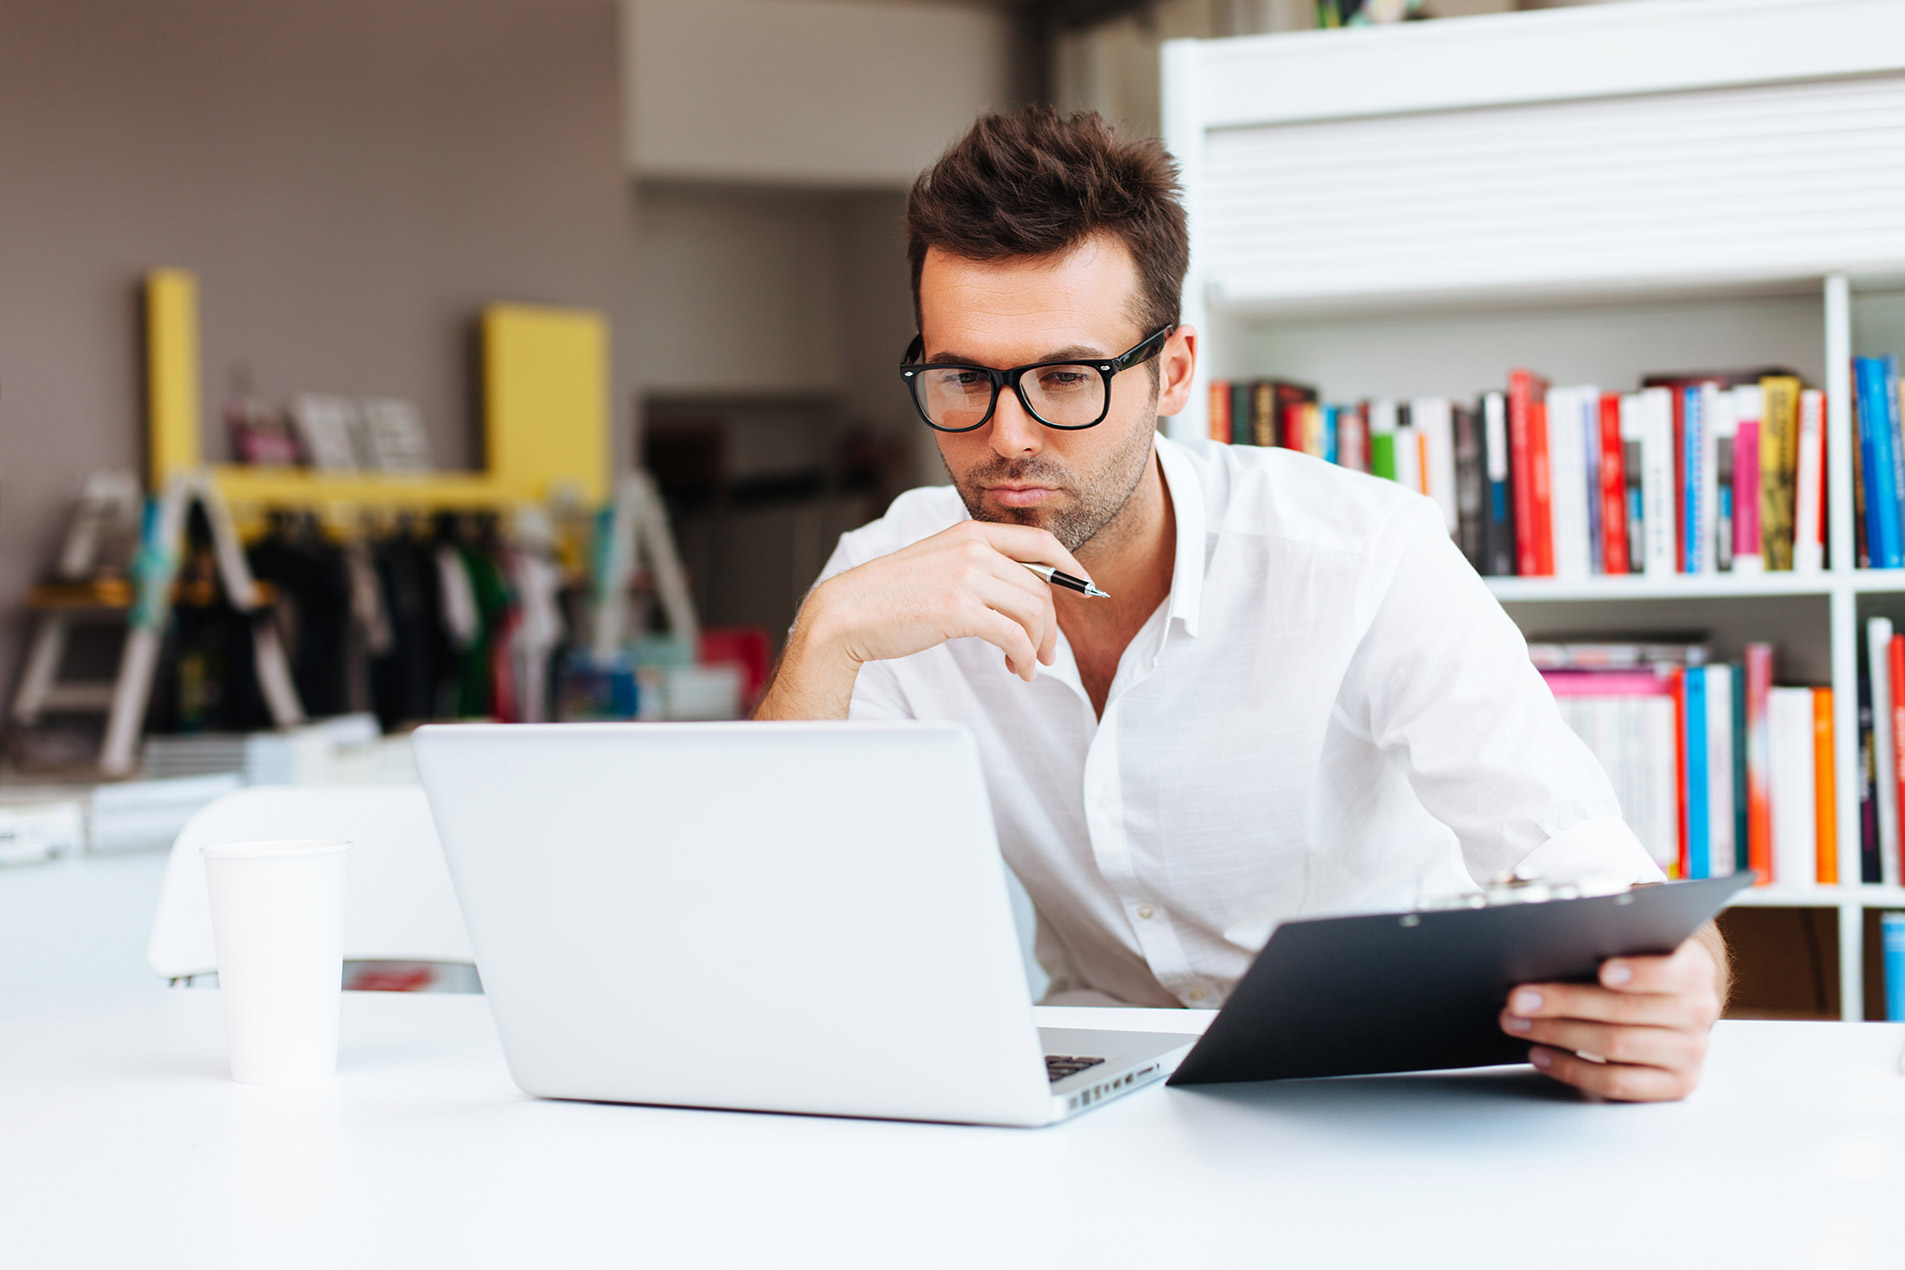 Freelance writing service работа удаленно пятидневка